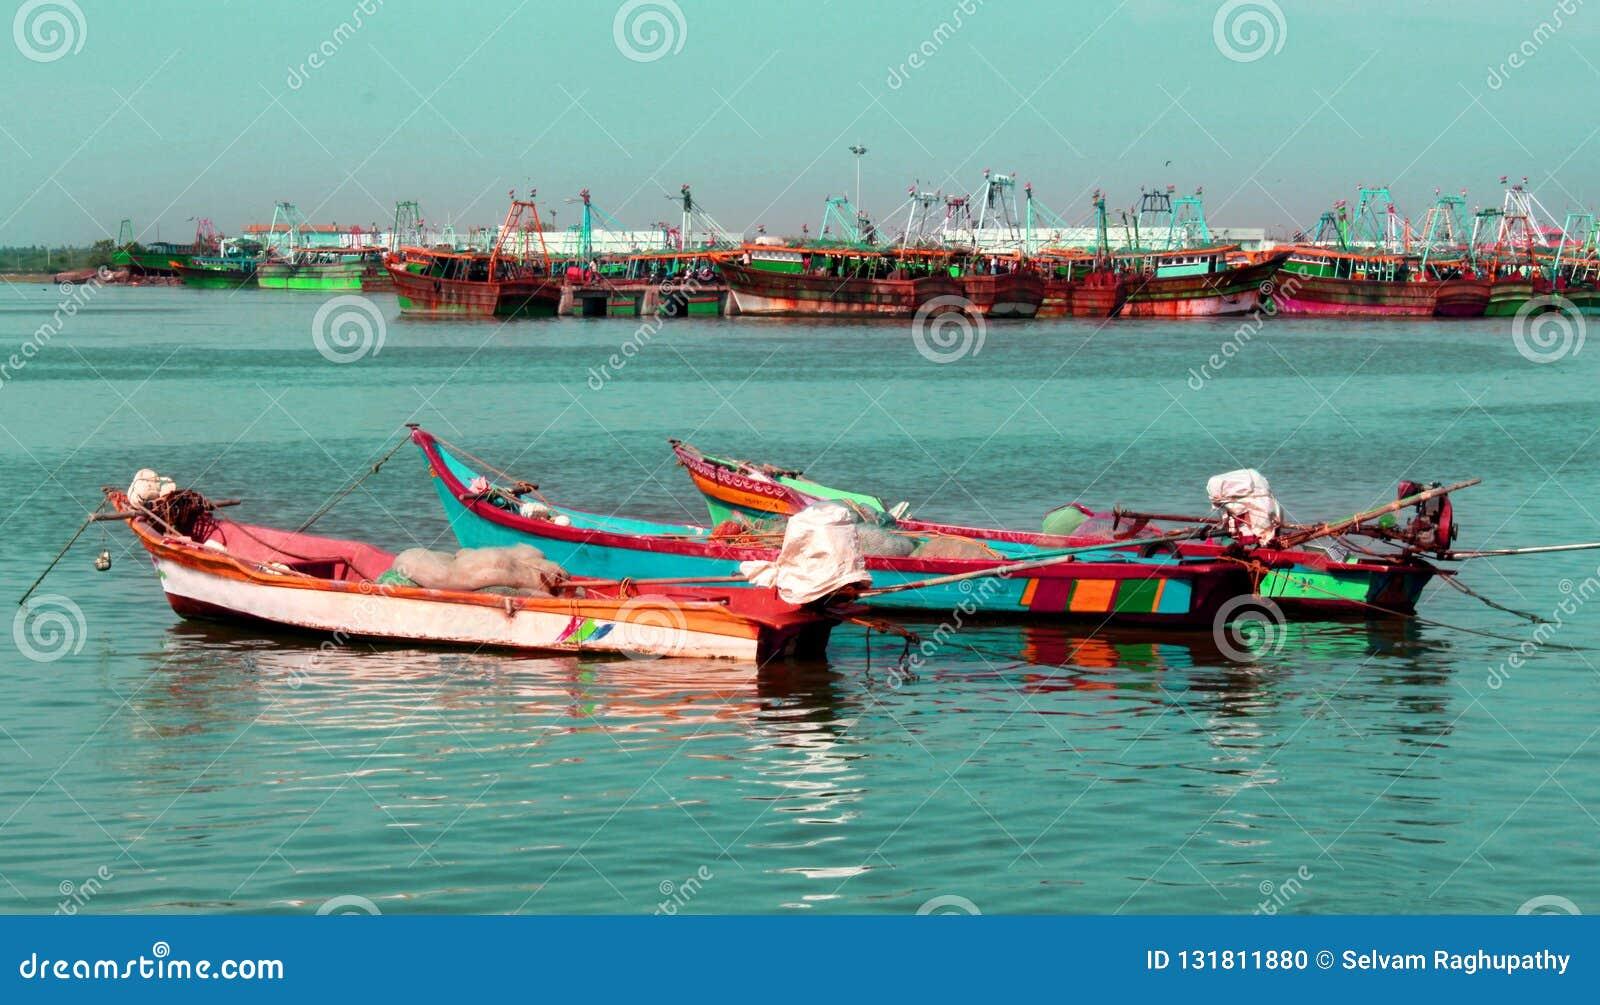 O grande e os botes estacionados no arasalaru do rio para aprontar-se para travar peixes